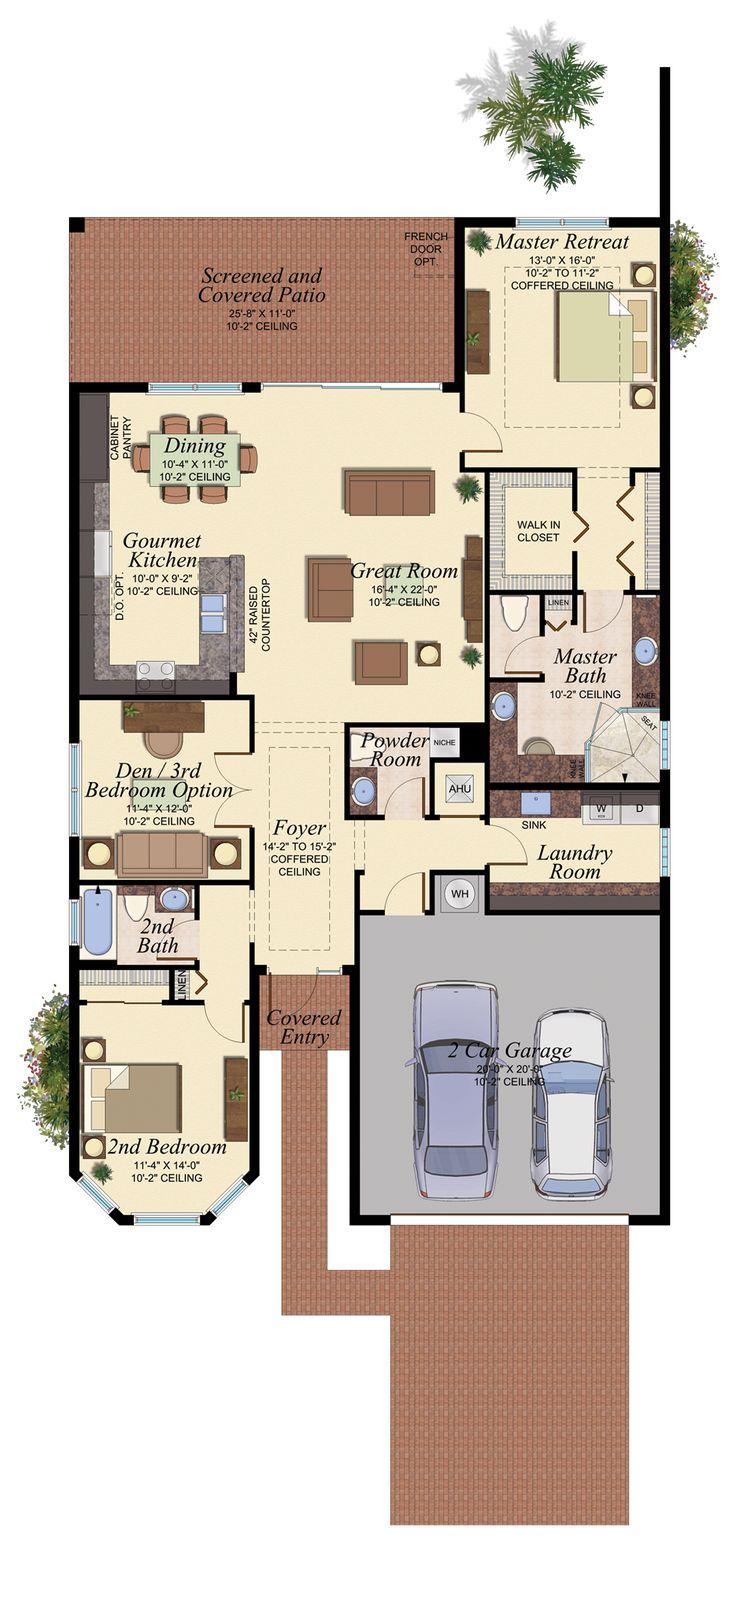 9e8f2f81fa964567ffc01c6600b28738 Valencia Floor Plan House on valencia hotel, valencia architecture, valencia food, valencia furniture,